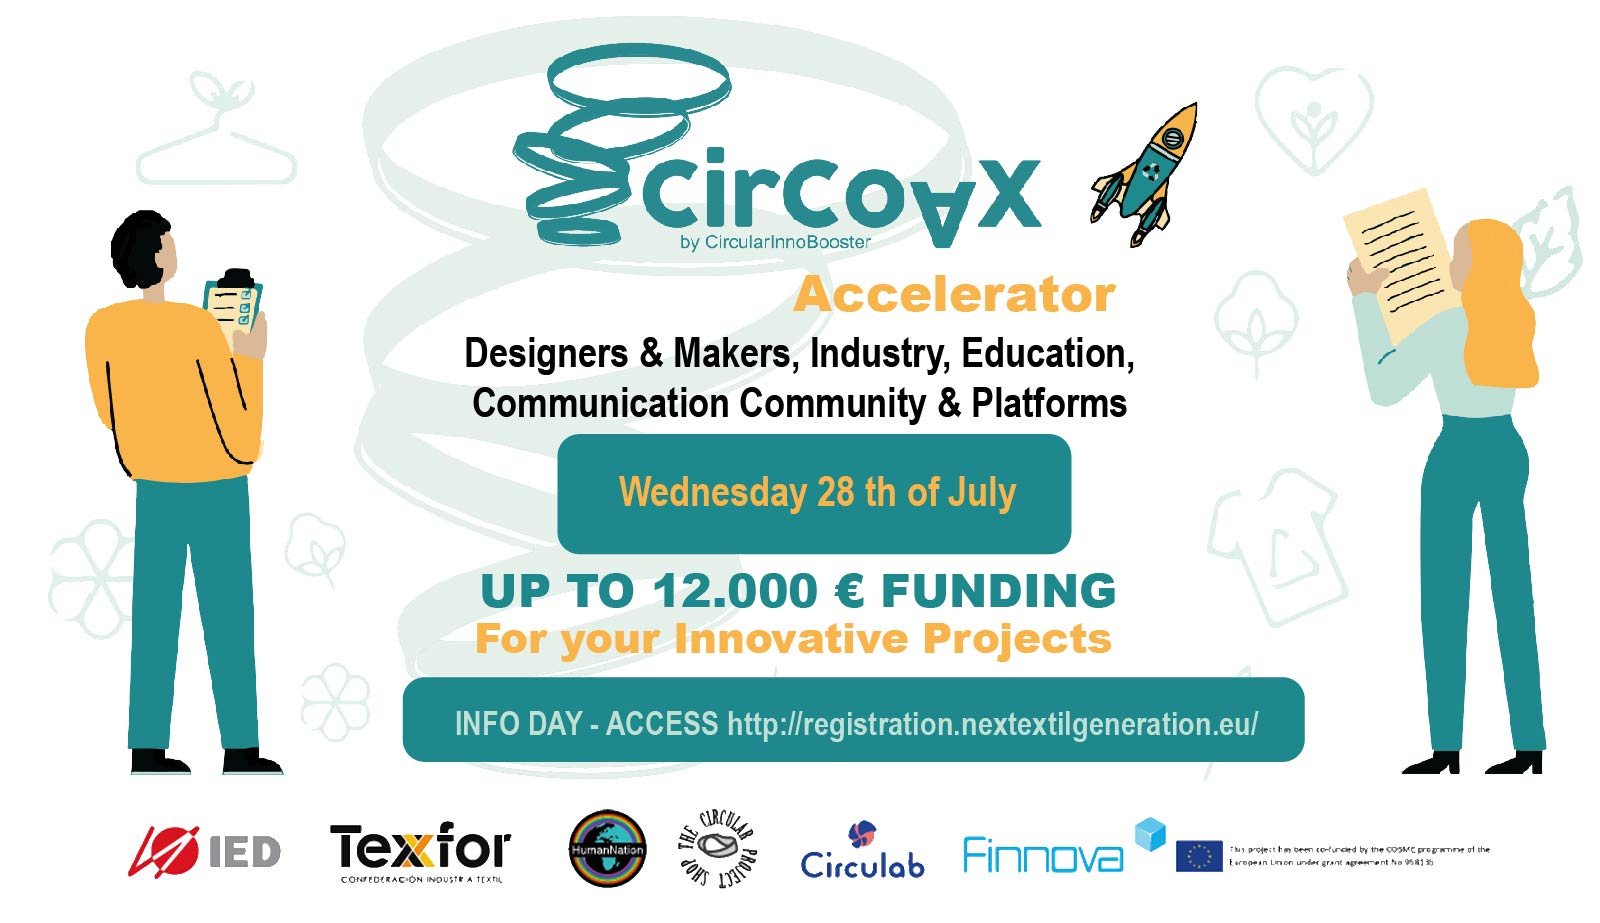 Banner-Circoax-Accelerator_Inglés-2-DIA-28